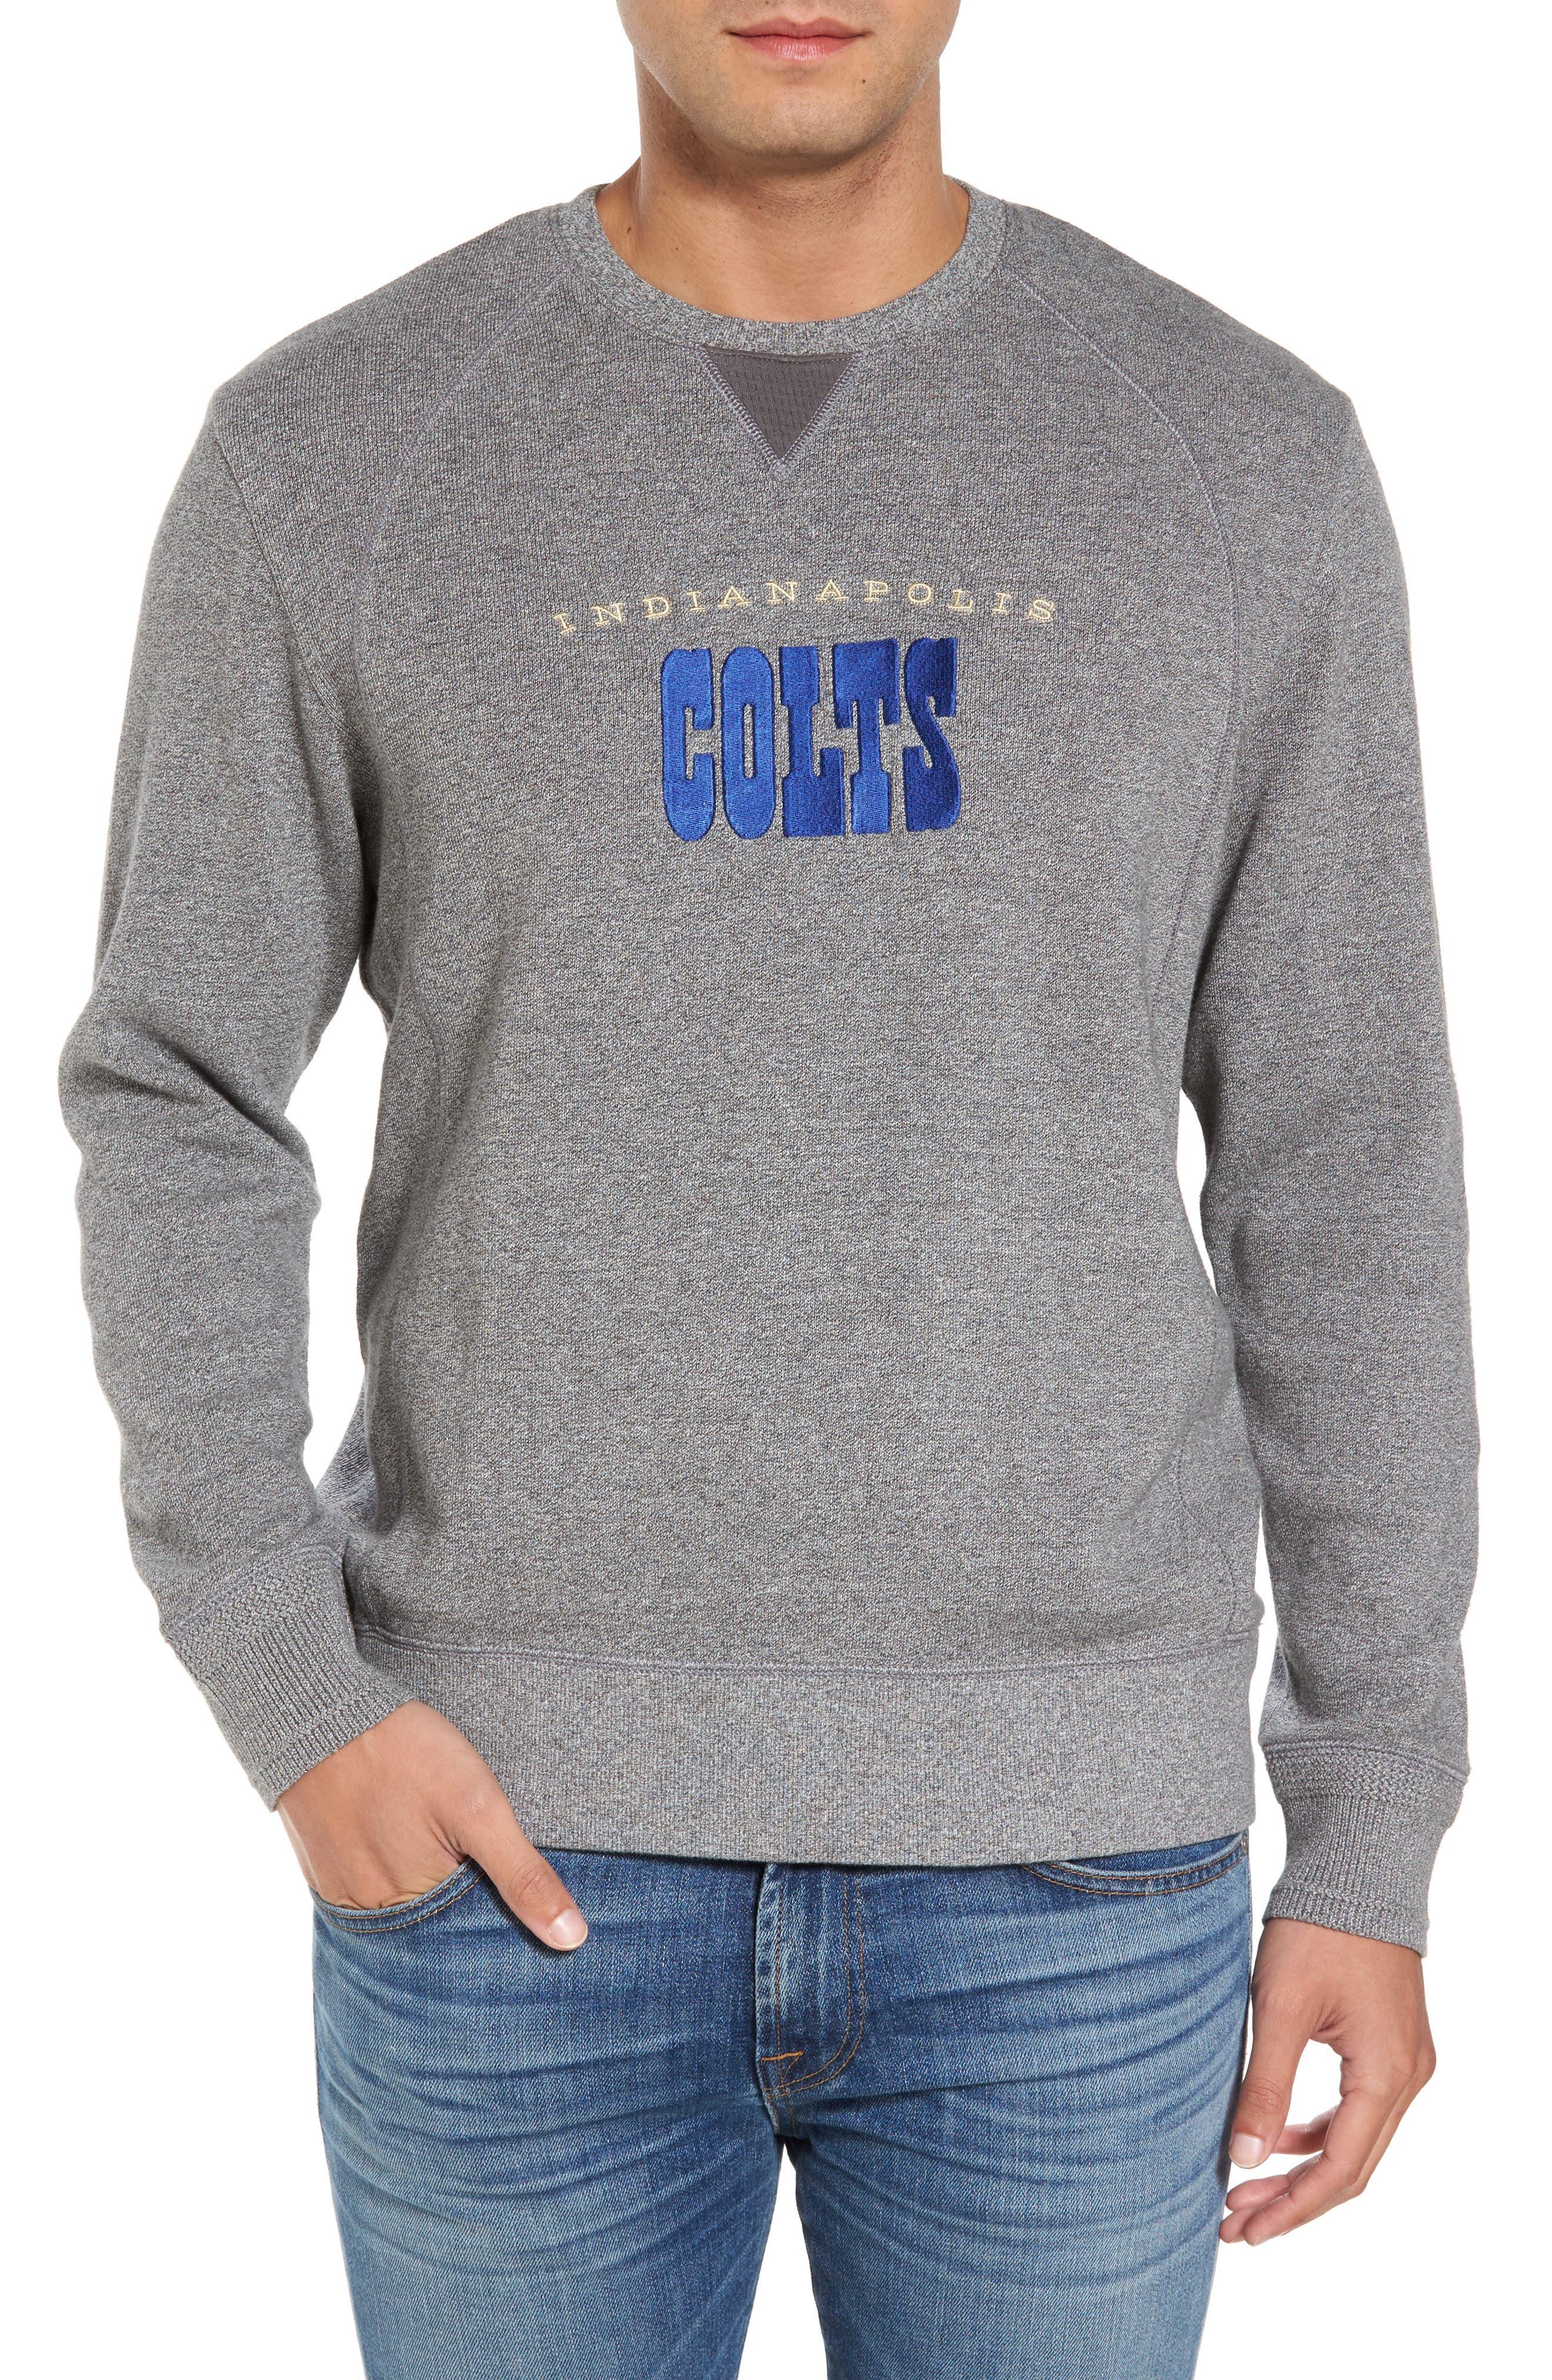 NFL Stitch of Liberty Embroidered Crewneck Sweatshirt,                             Main thumbnail 11, color,